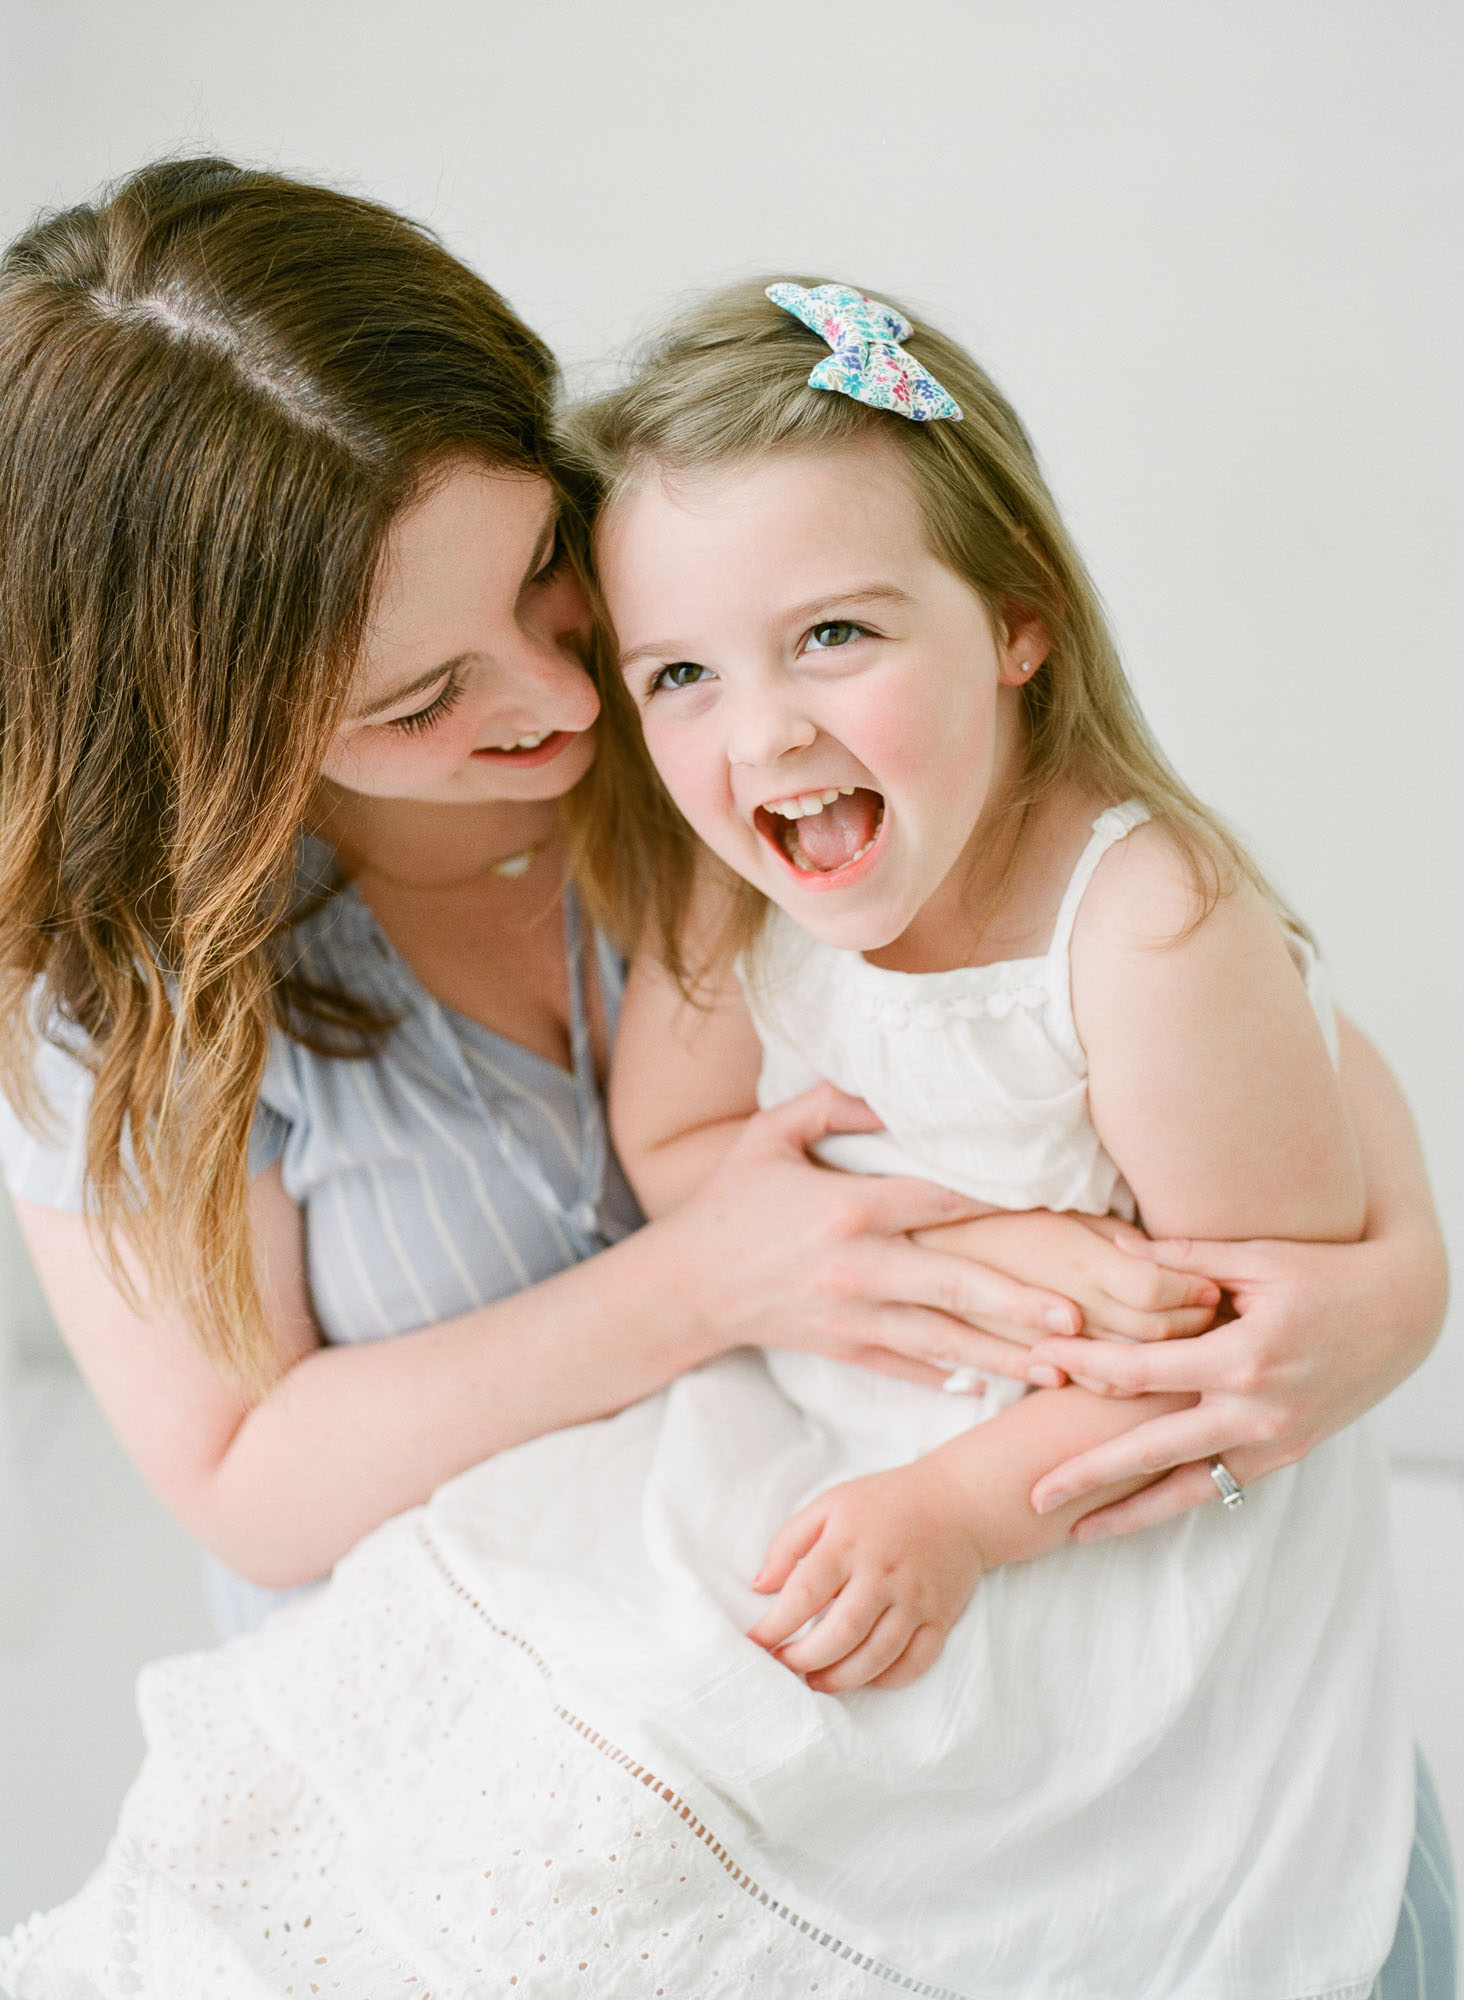 wake-forest-family-photographer-studio-session-motherhood-004